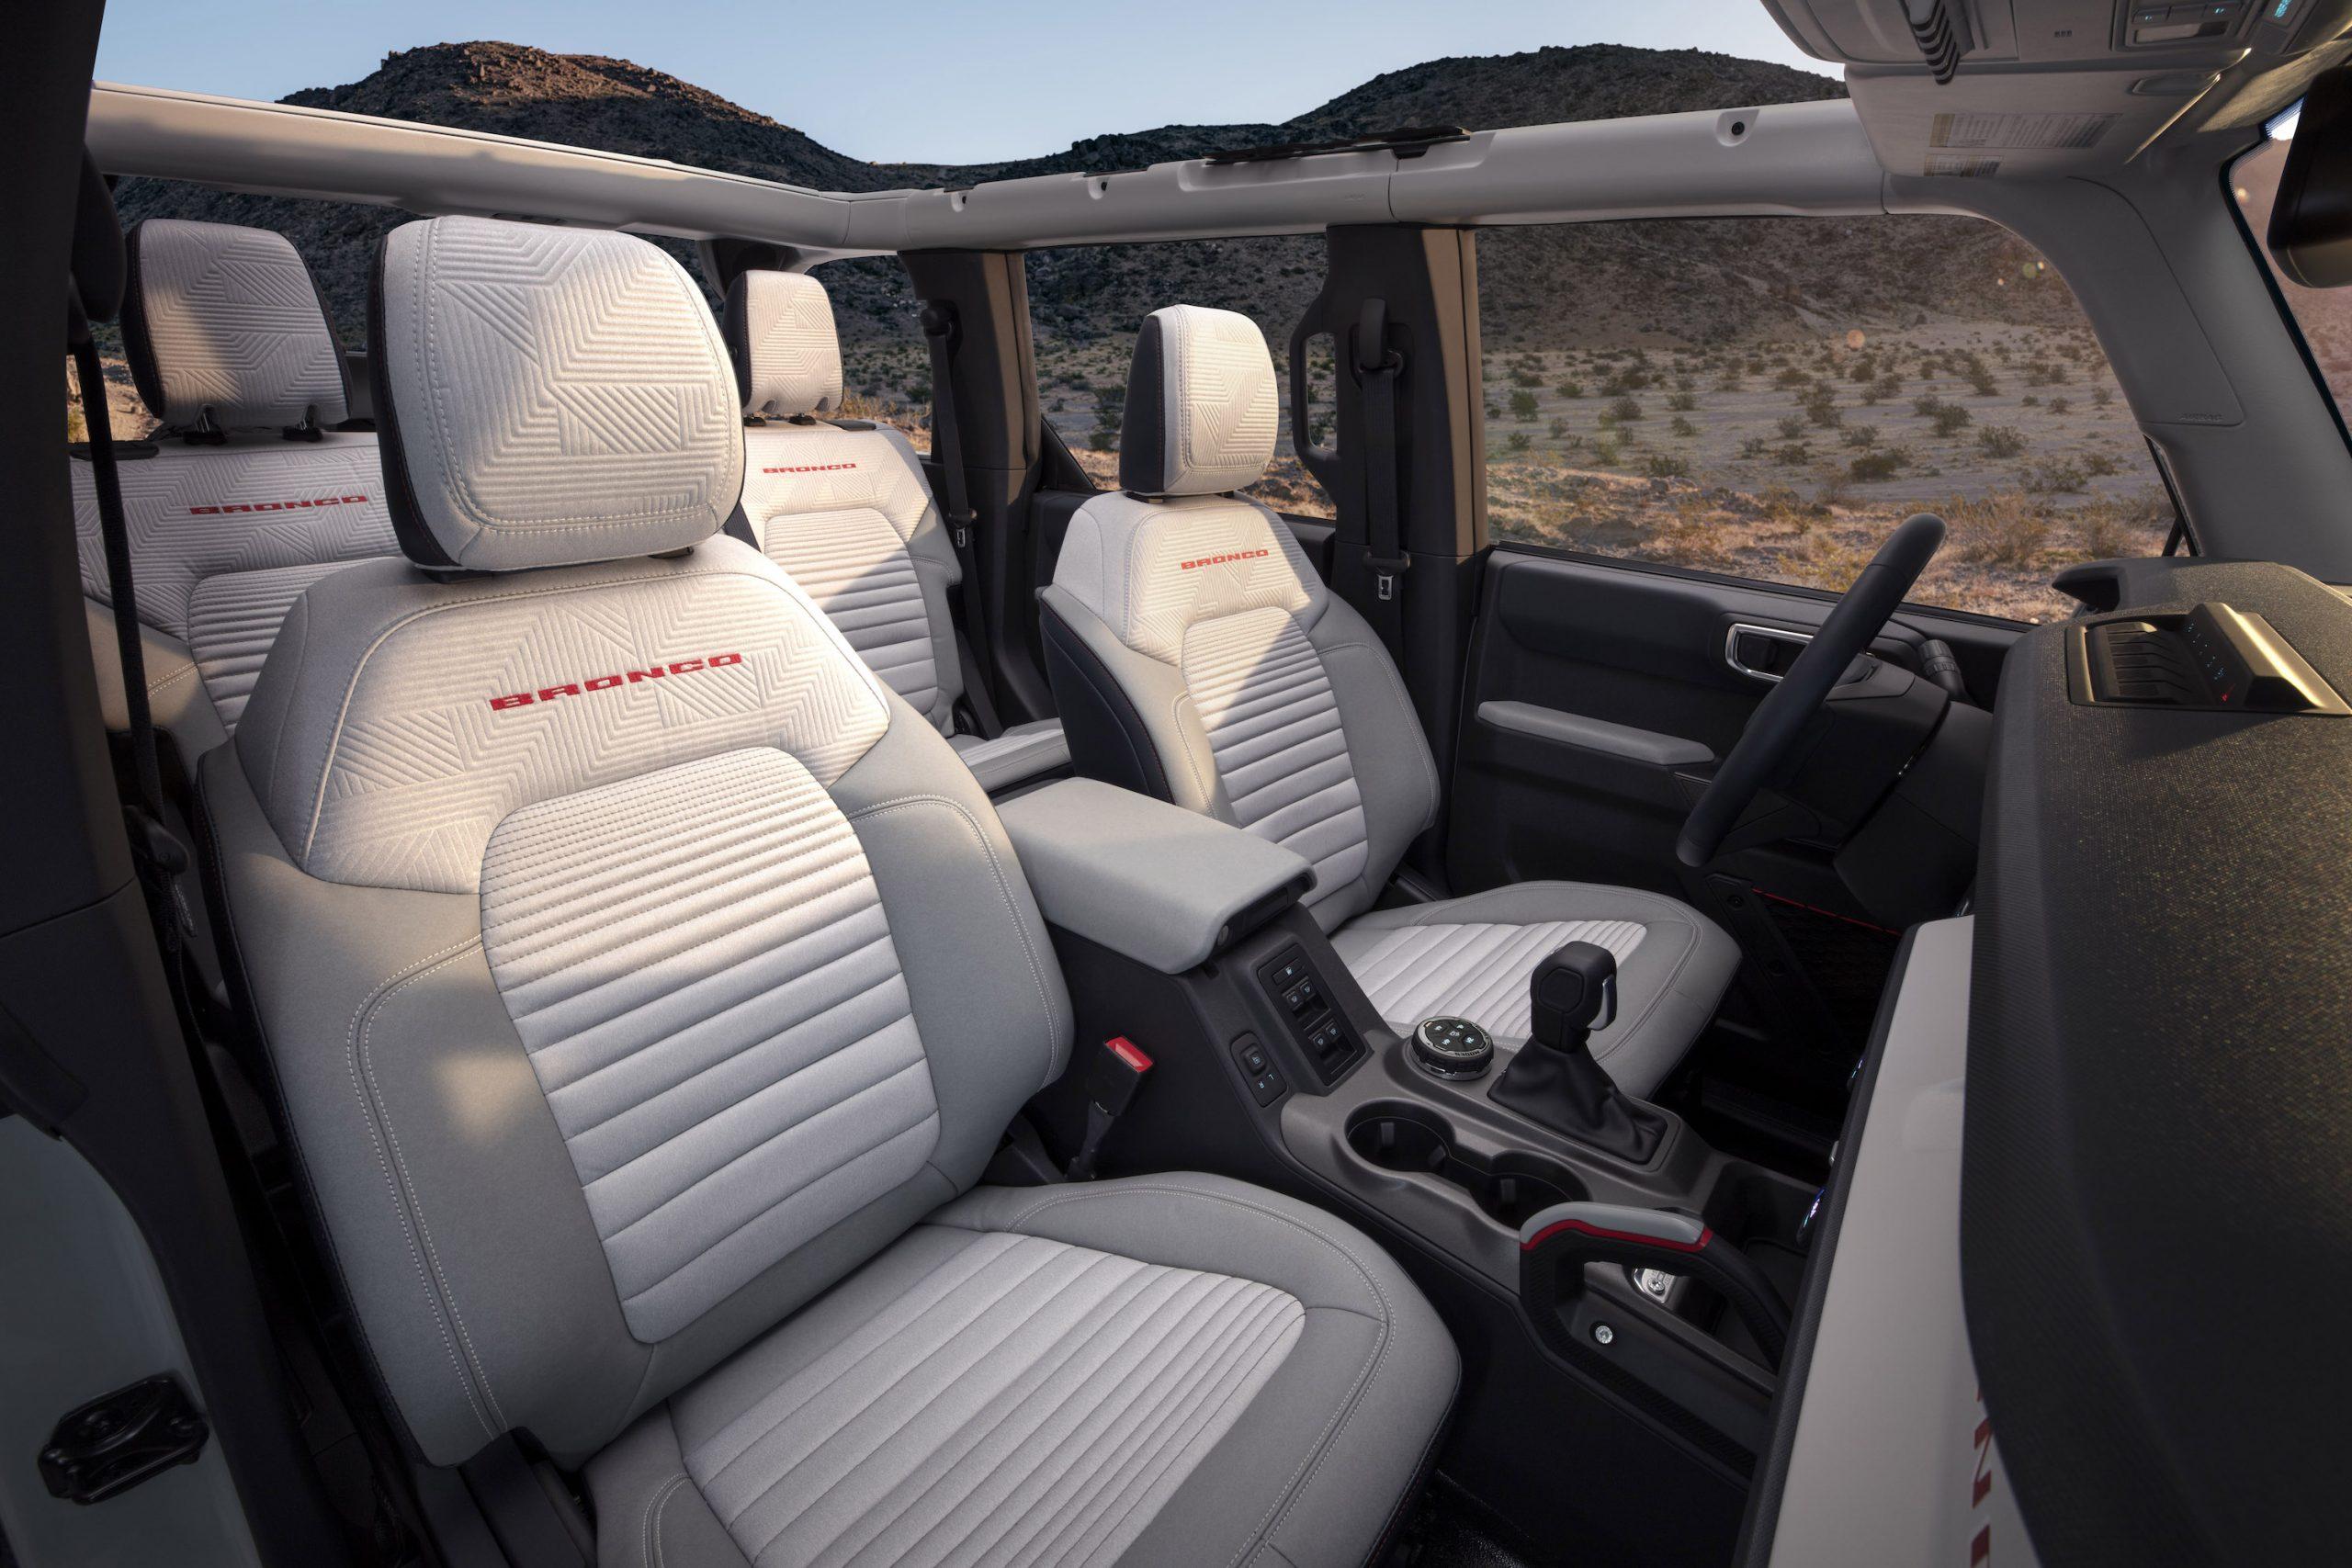 2021 Ford Bronco Four Door Interior